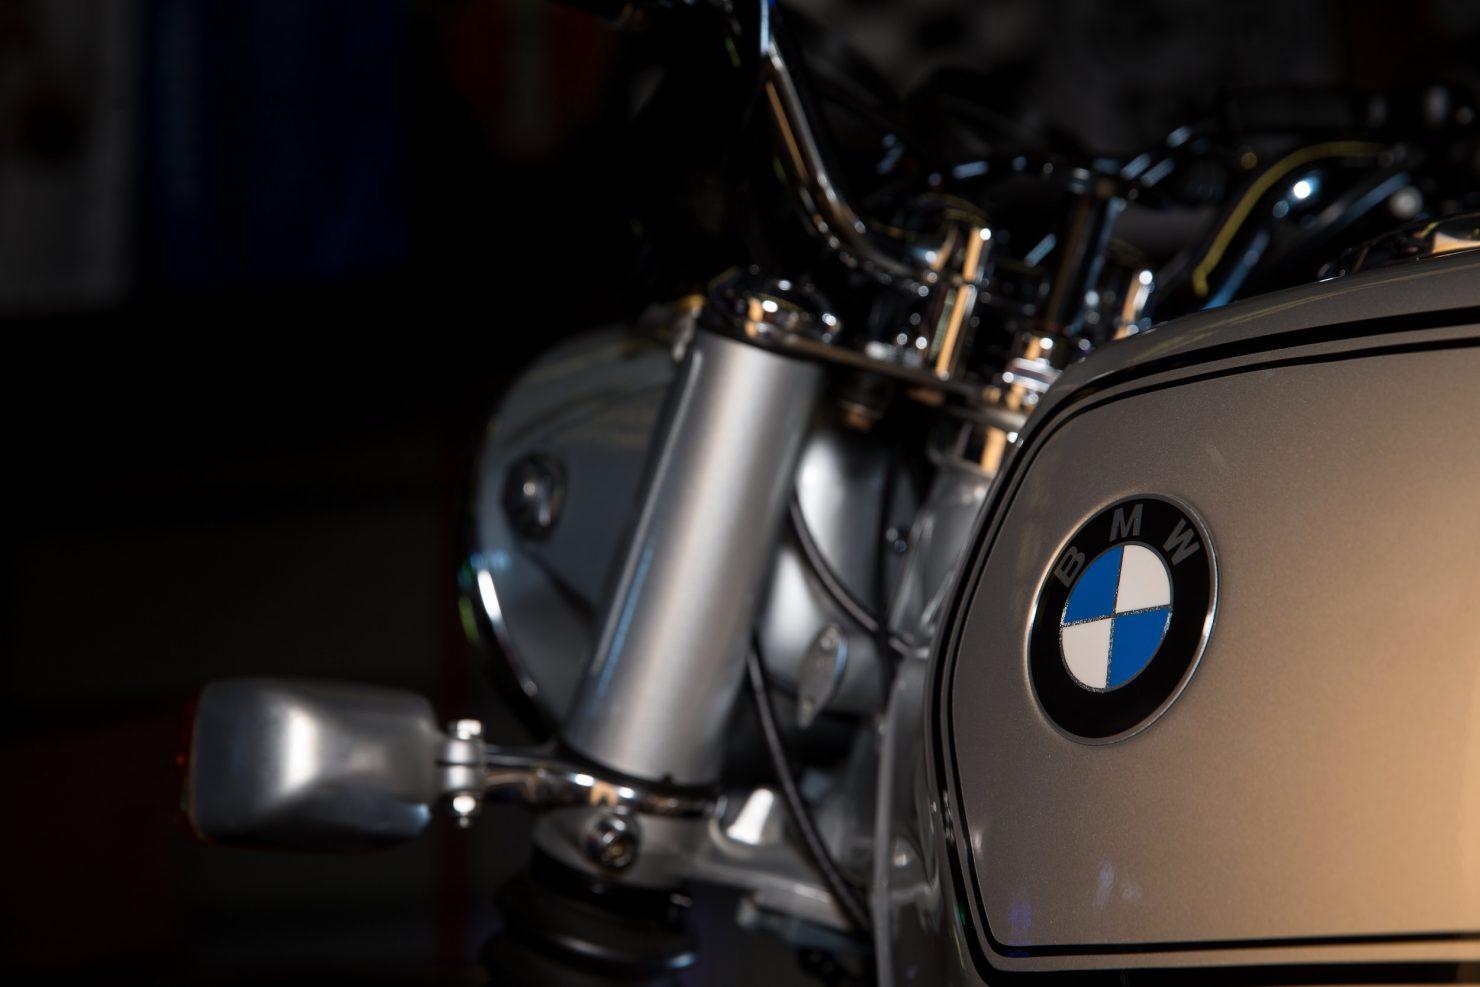 AM6P0354 1480x987 - Immaculately Restored: BMW R75/6